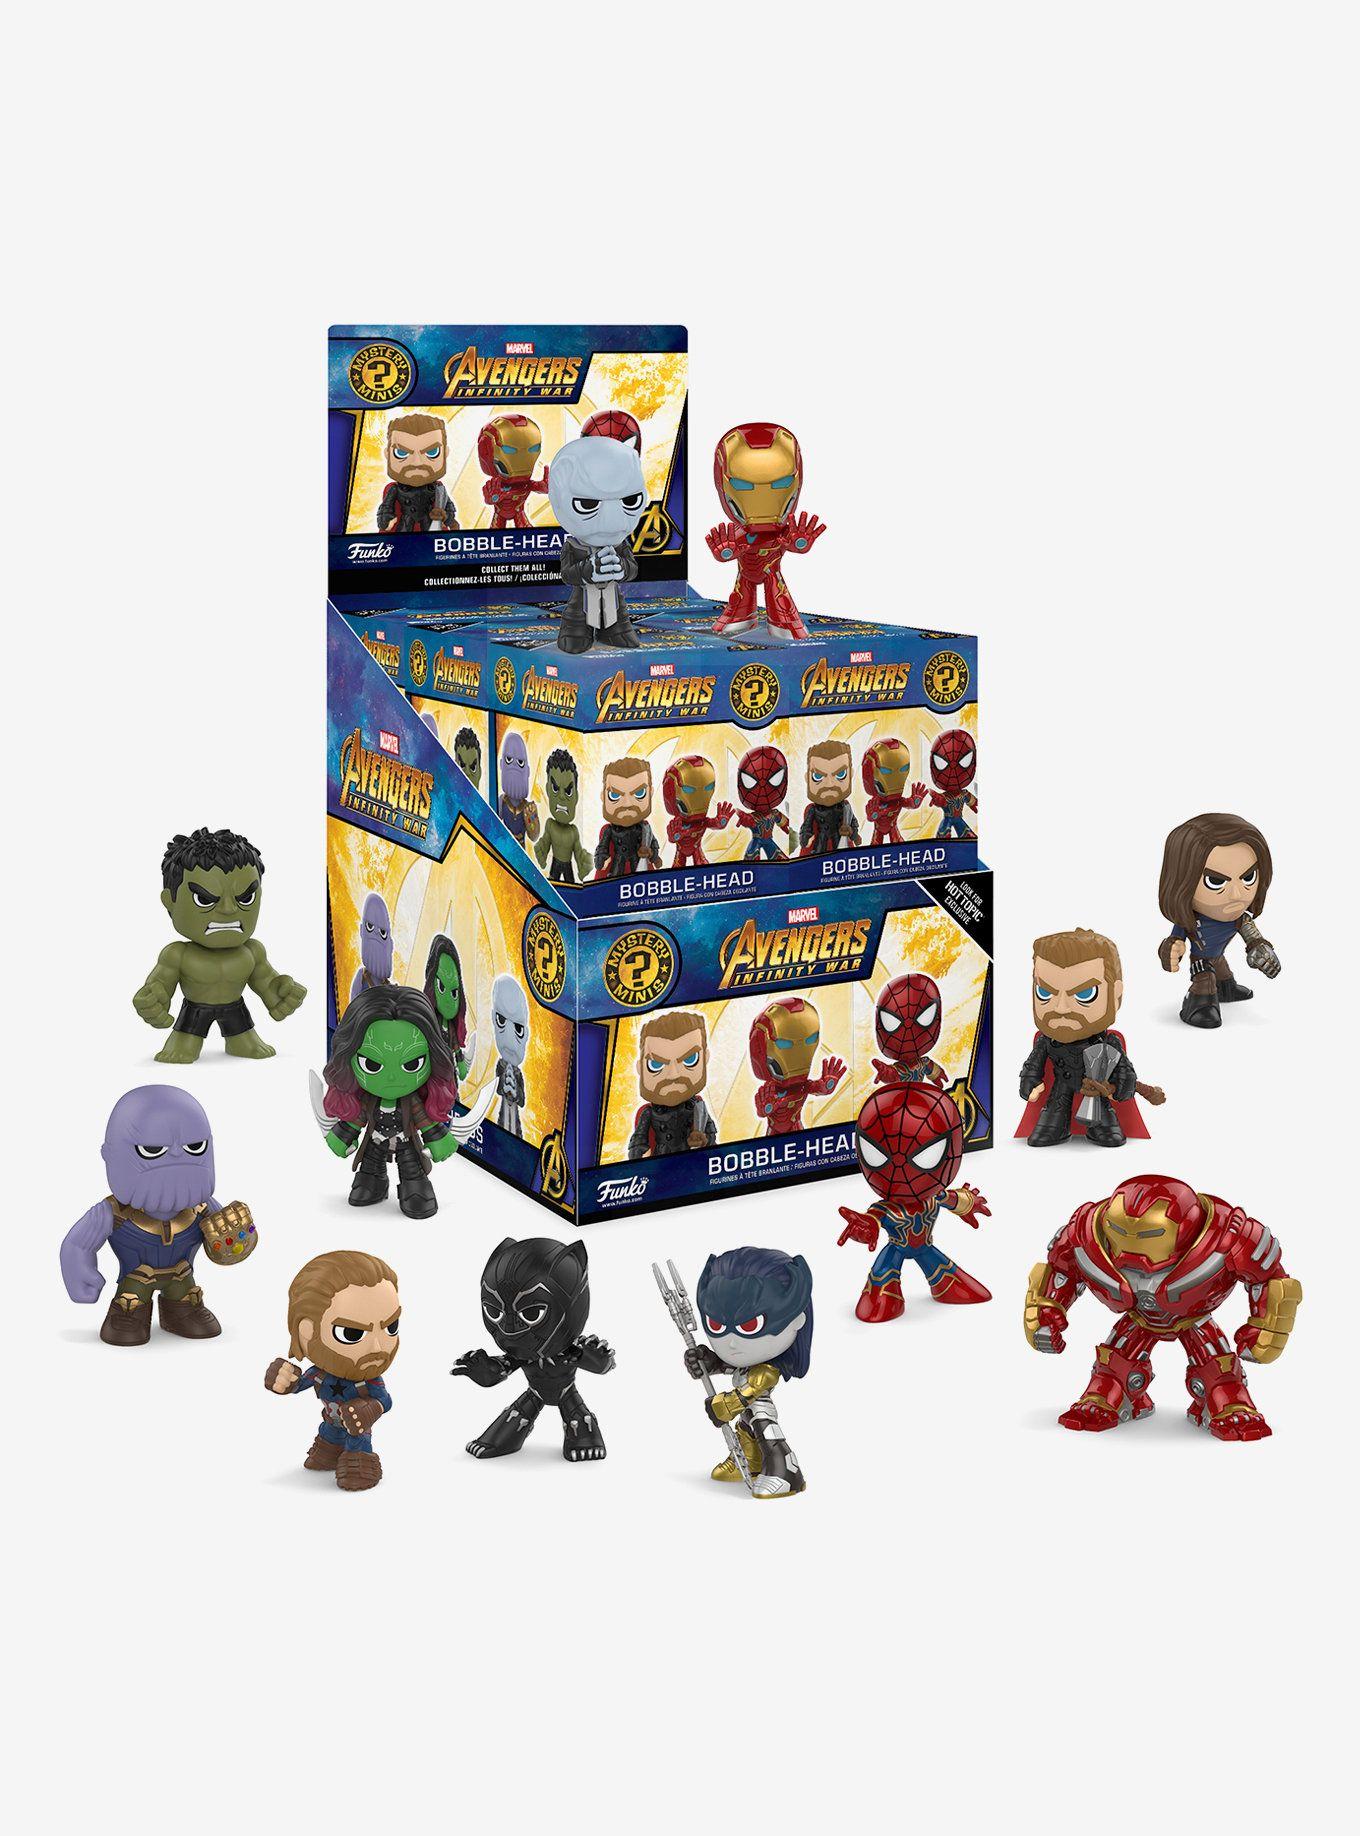 Marvel Avengers Infinity War Mystery Minis Blind Box Vinyl Bobble Head Hot Topic Exclusive Mystery Minis Marvel Infinity War Avengers Infinity War